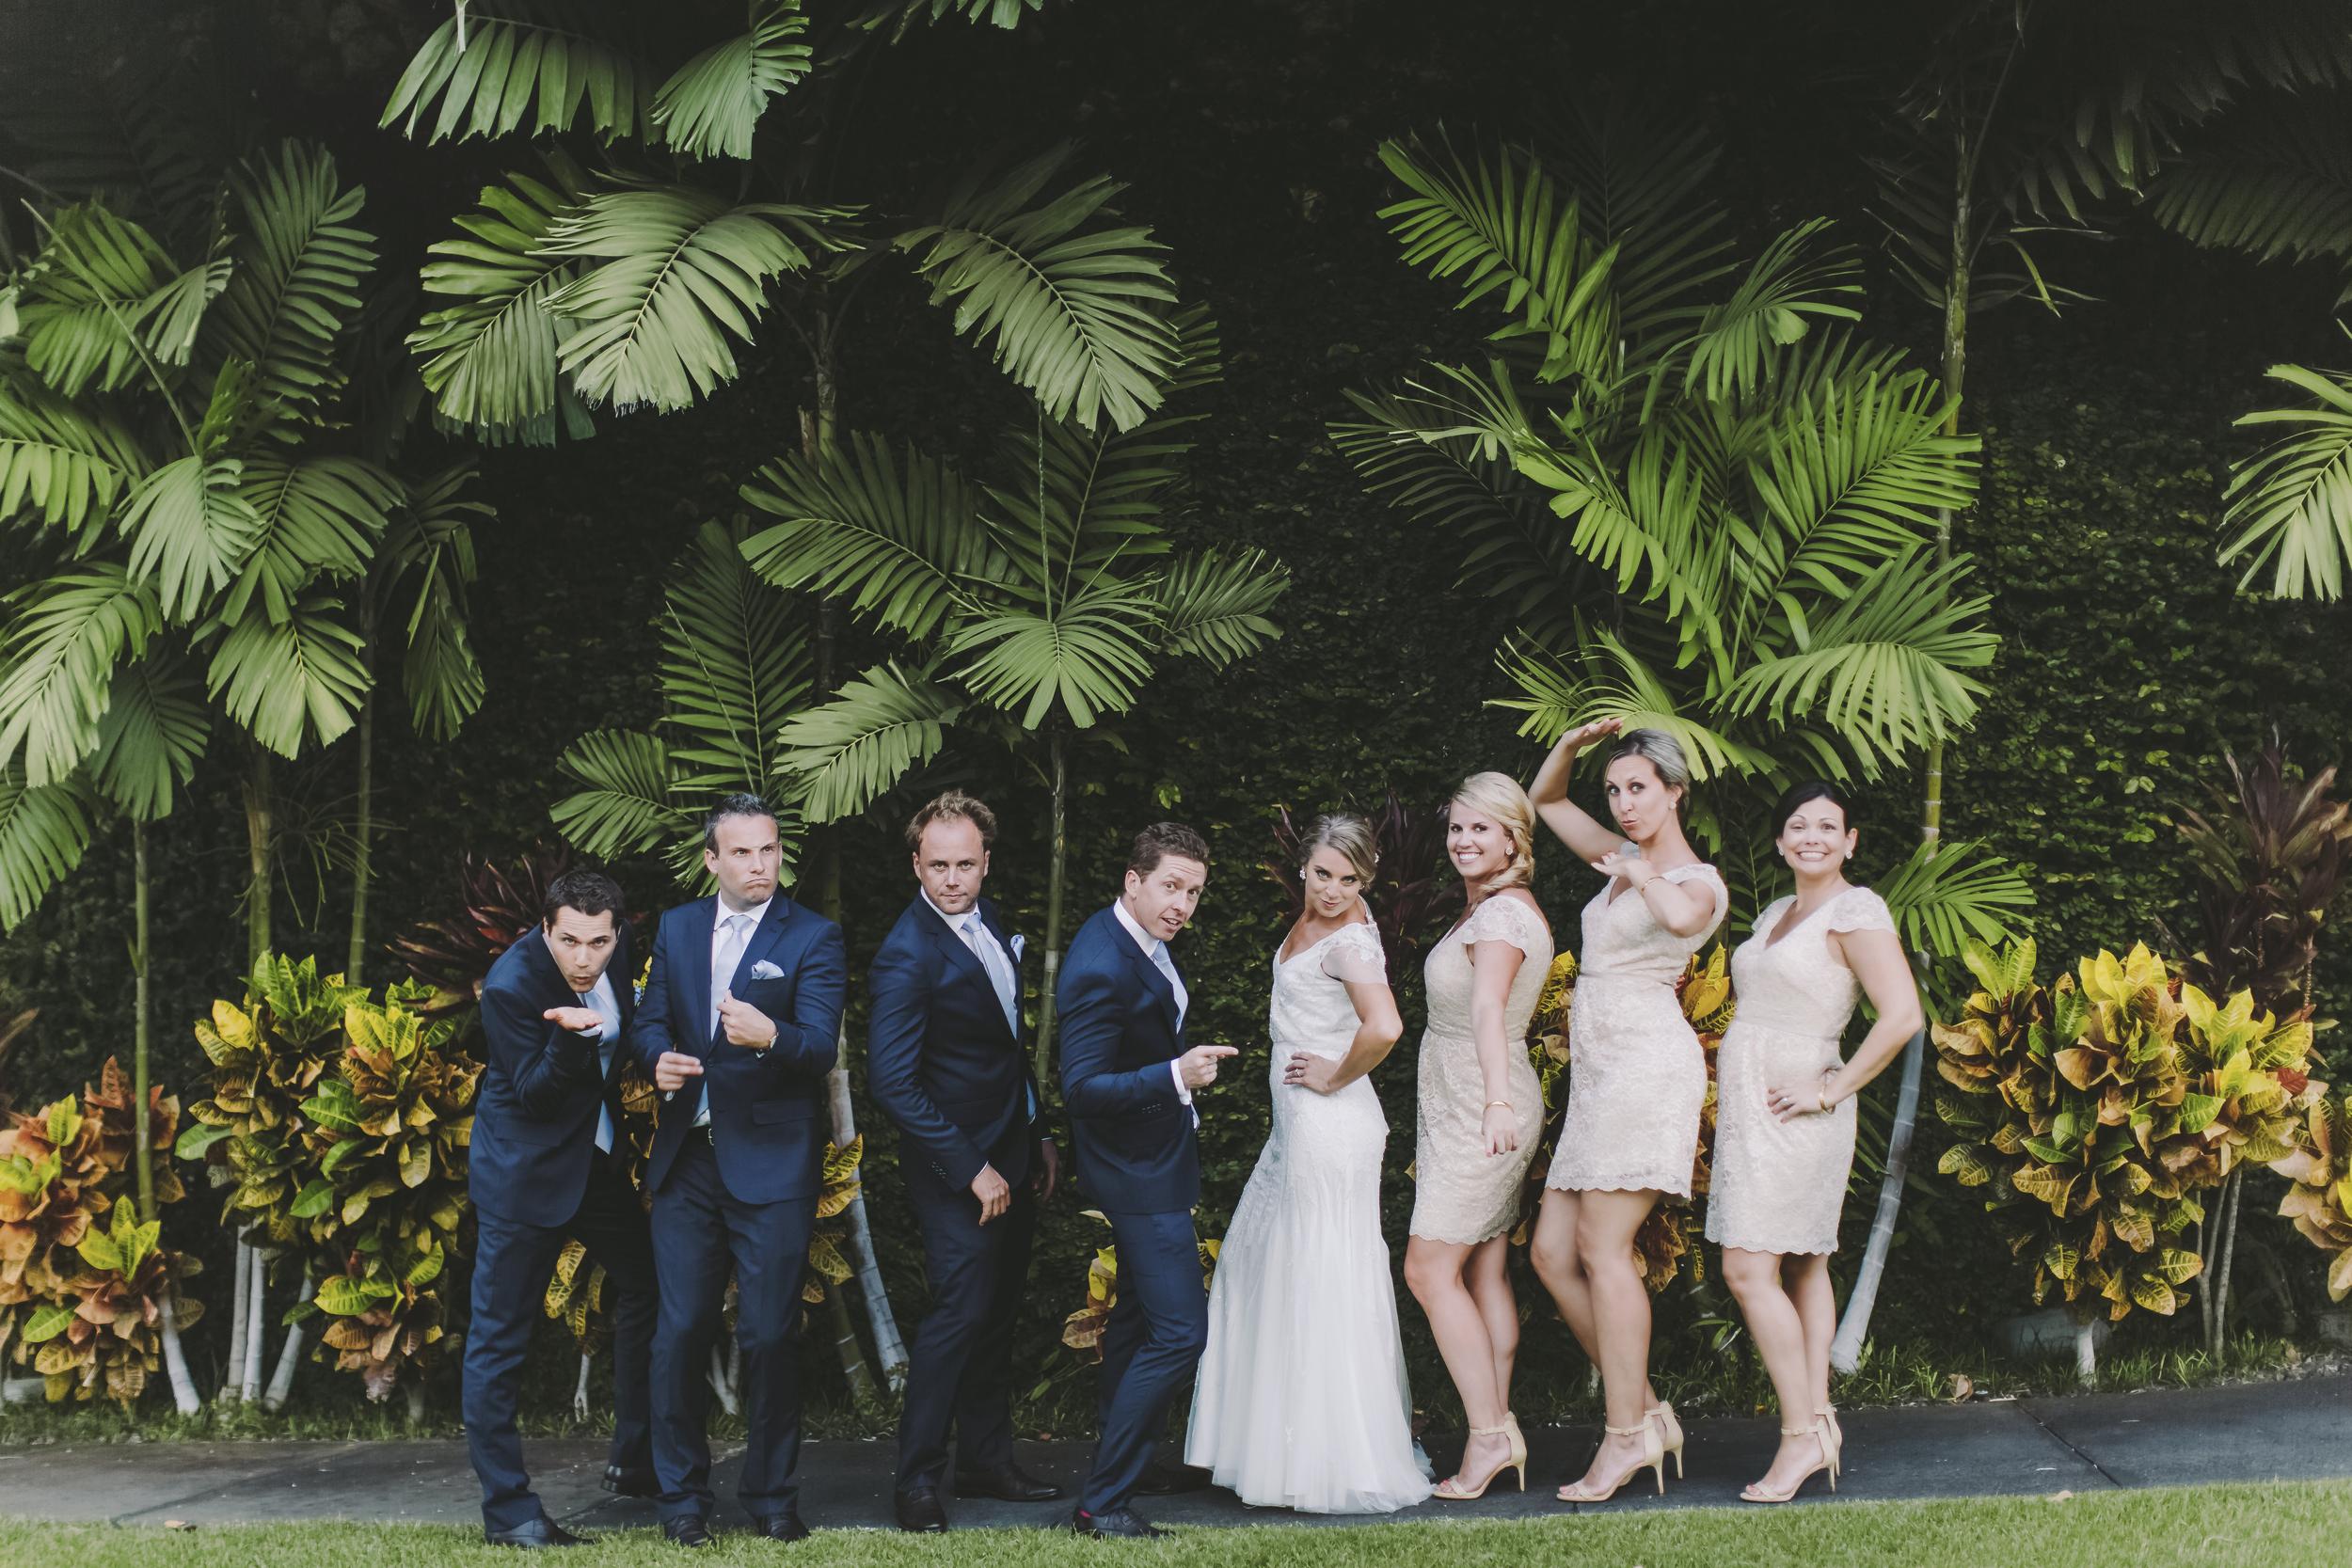 angie-diaz-photography-maui-wedding-mel-matt-90.jpg